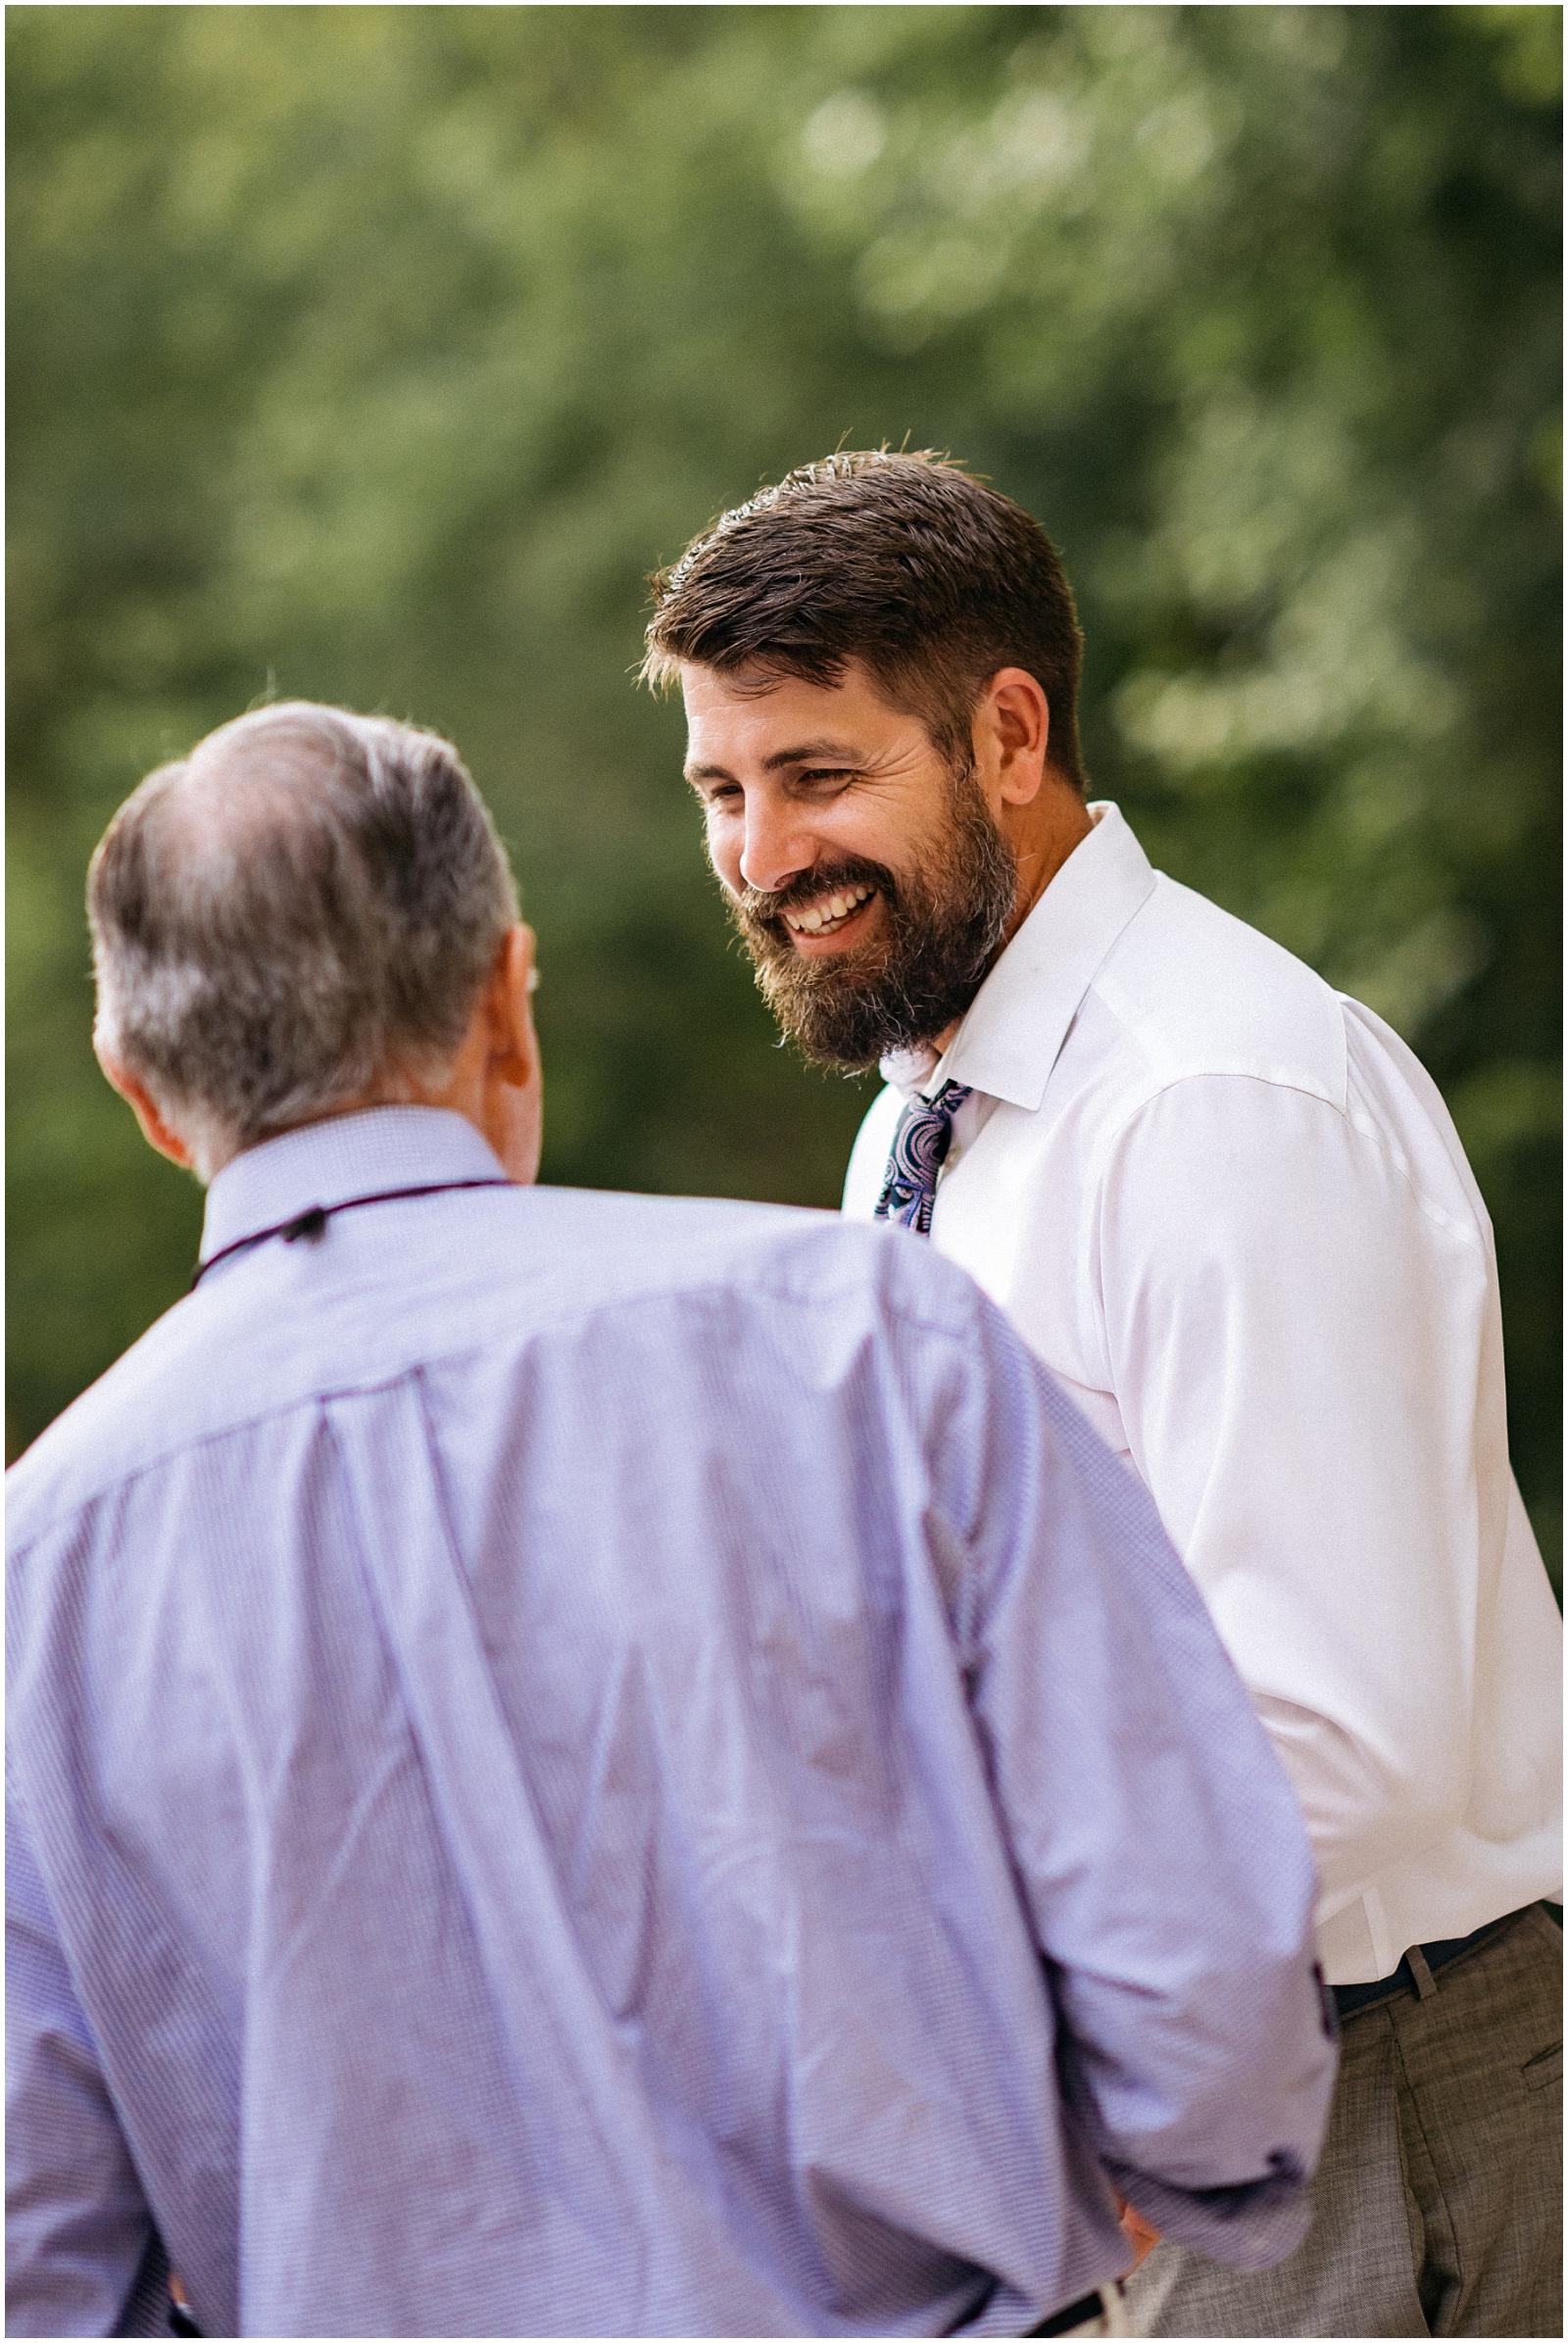 Ryan_Rechelle_Nantahalla_Weddings_Andrews_NC-174_Ryan_Rechelle_McGuire's_Millrace_Andrews_NC.jpg